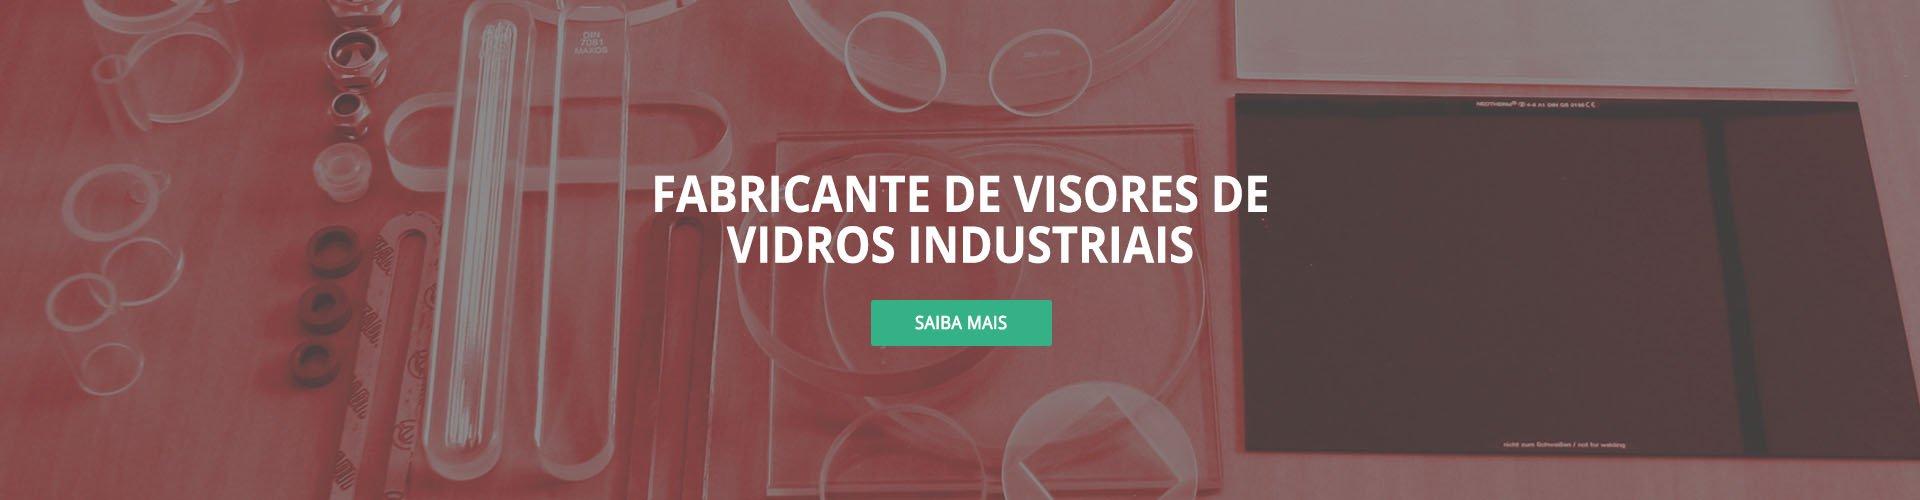 (c) Vidrak.com.br